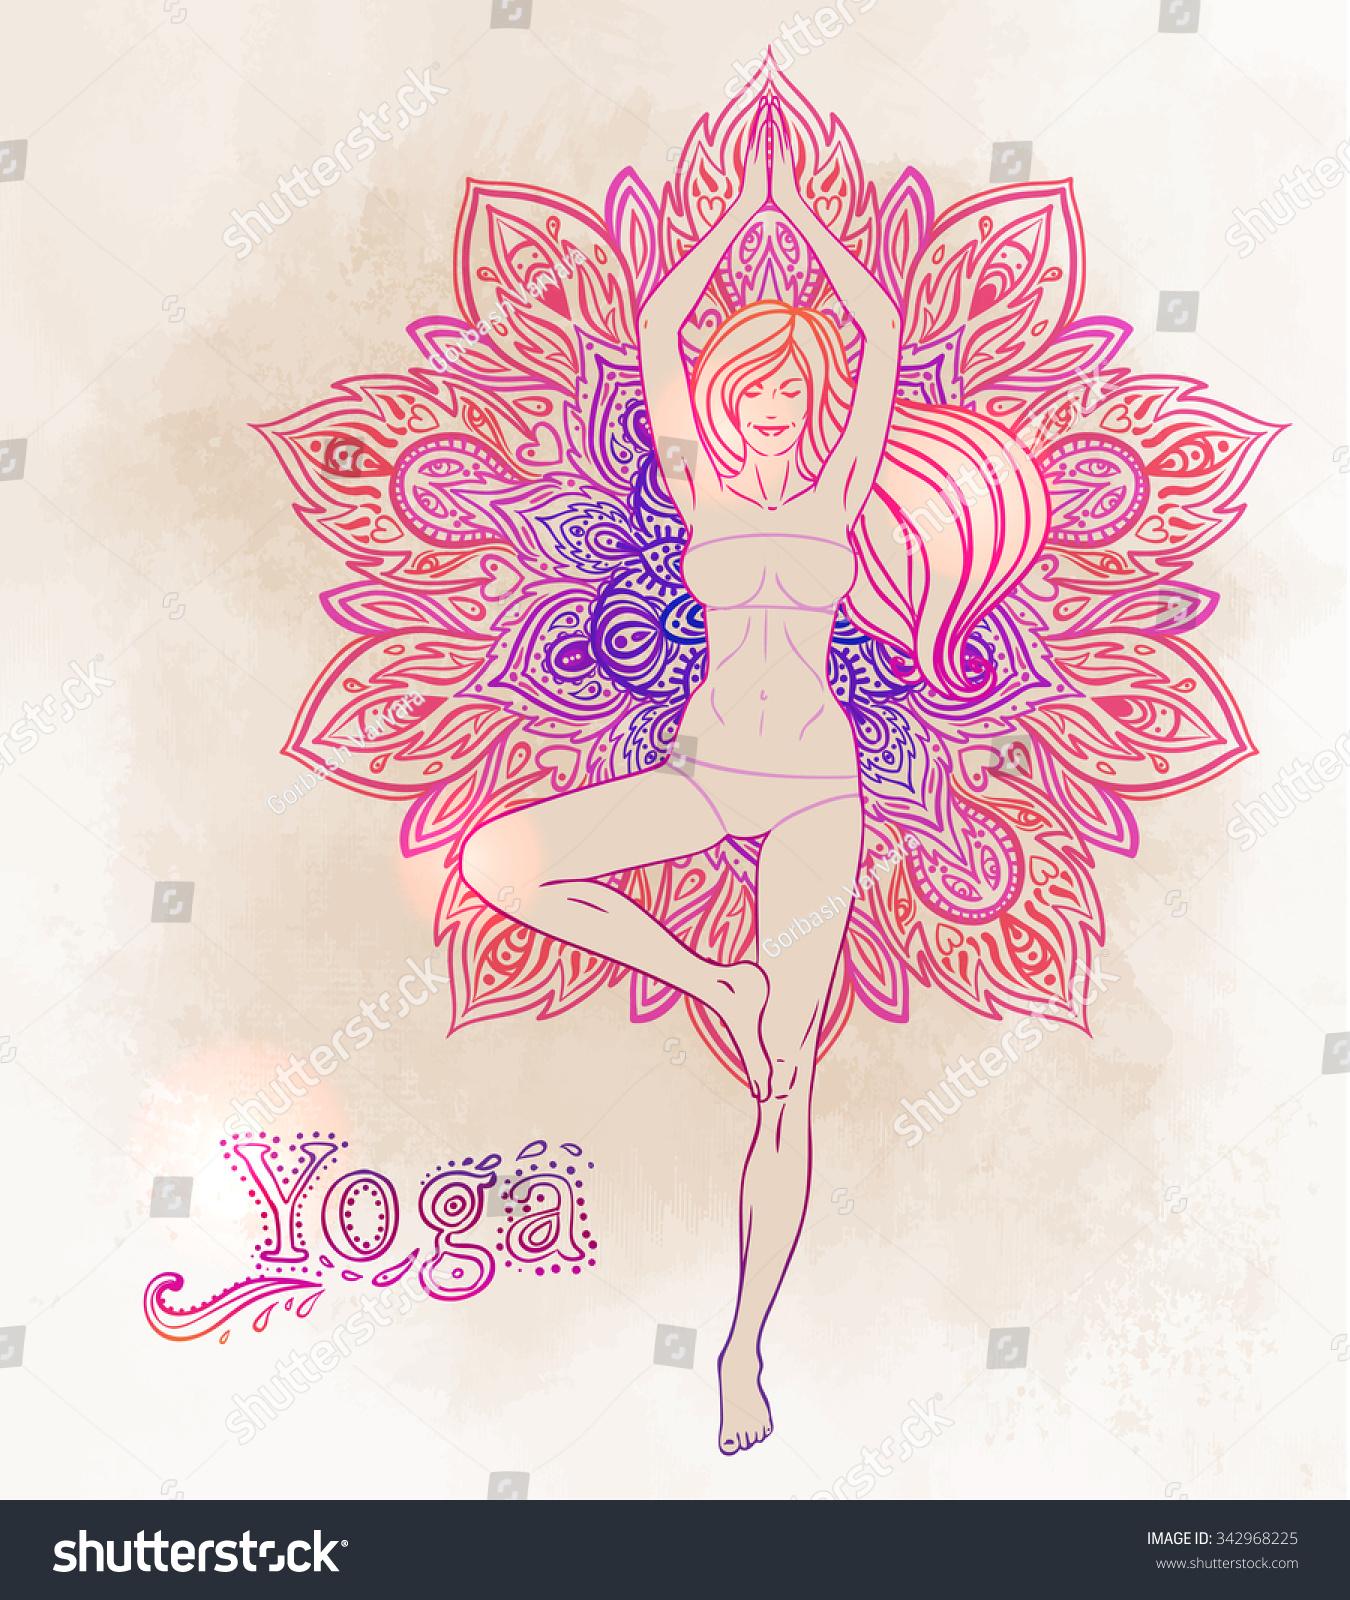 Young Pretty Girl Doing Yoga Vrikshasana Stock Vector (Royalty Free ...